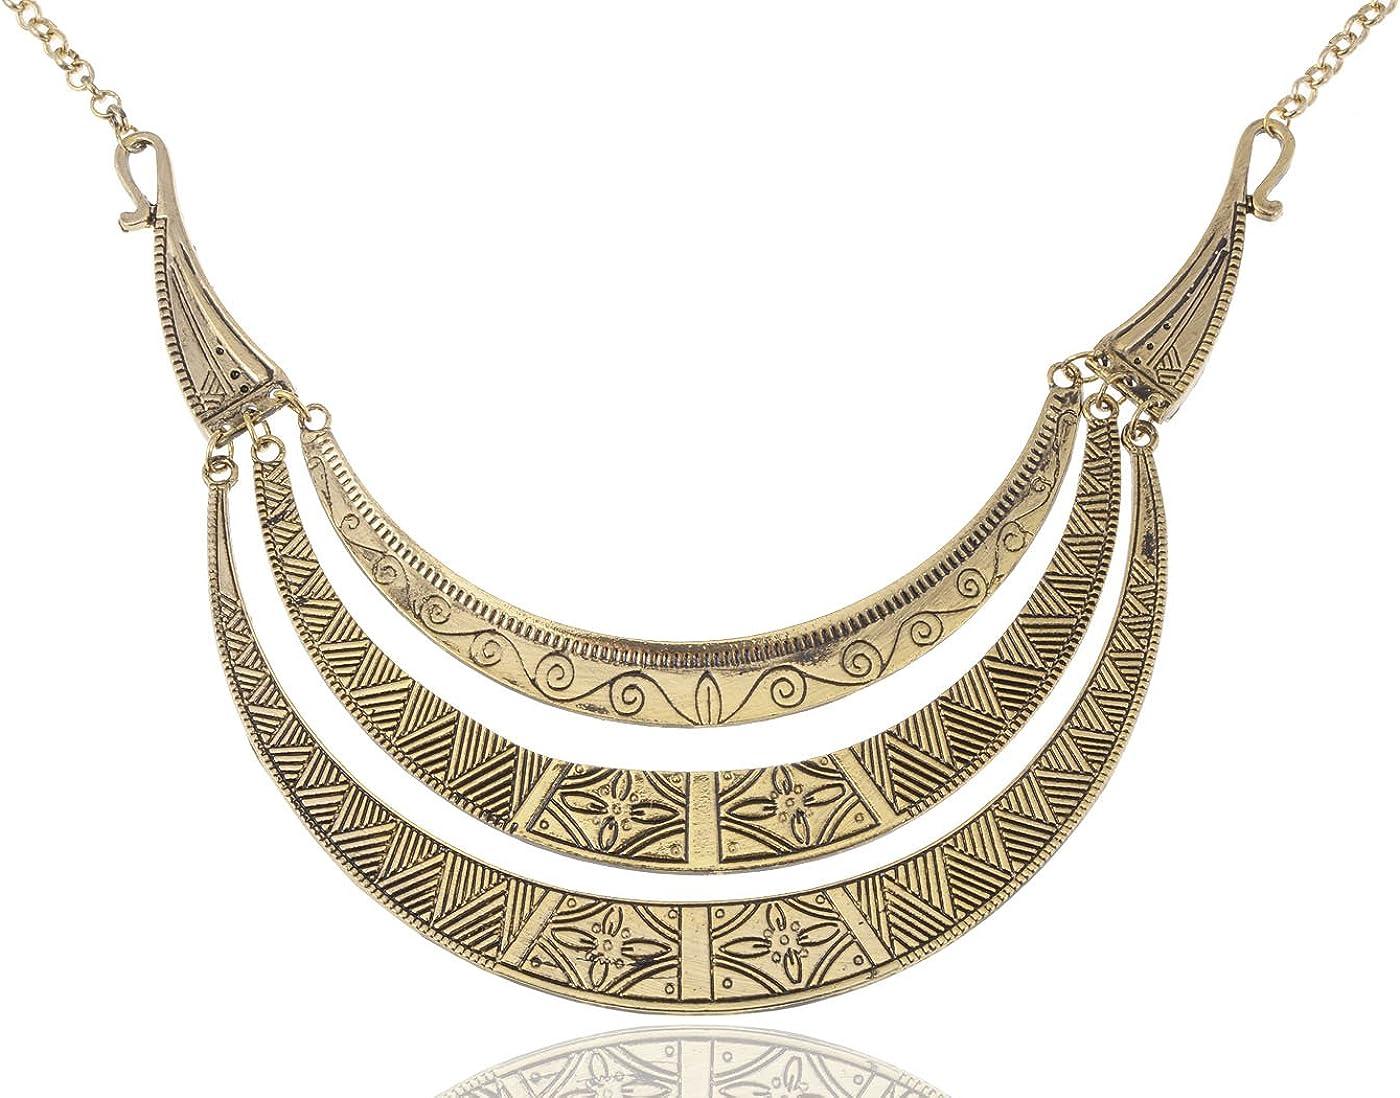 Alilang Vintage Egyptian Crescent Moon Shaped Bib Adjustable Statement Necklace